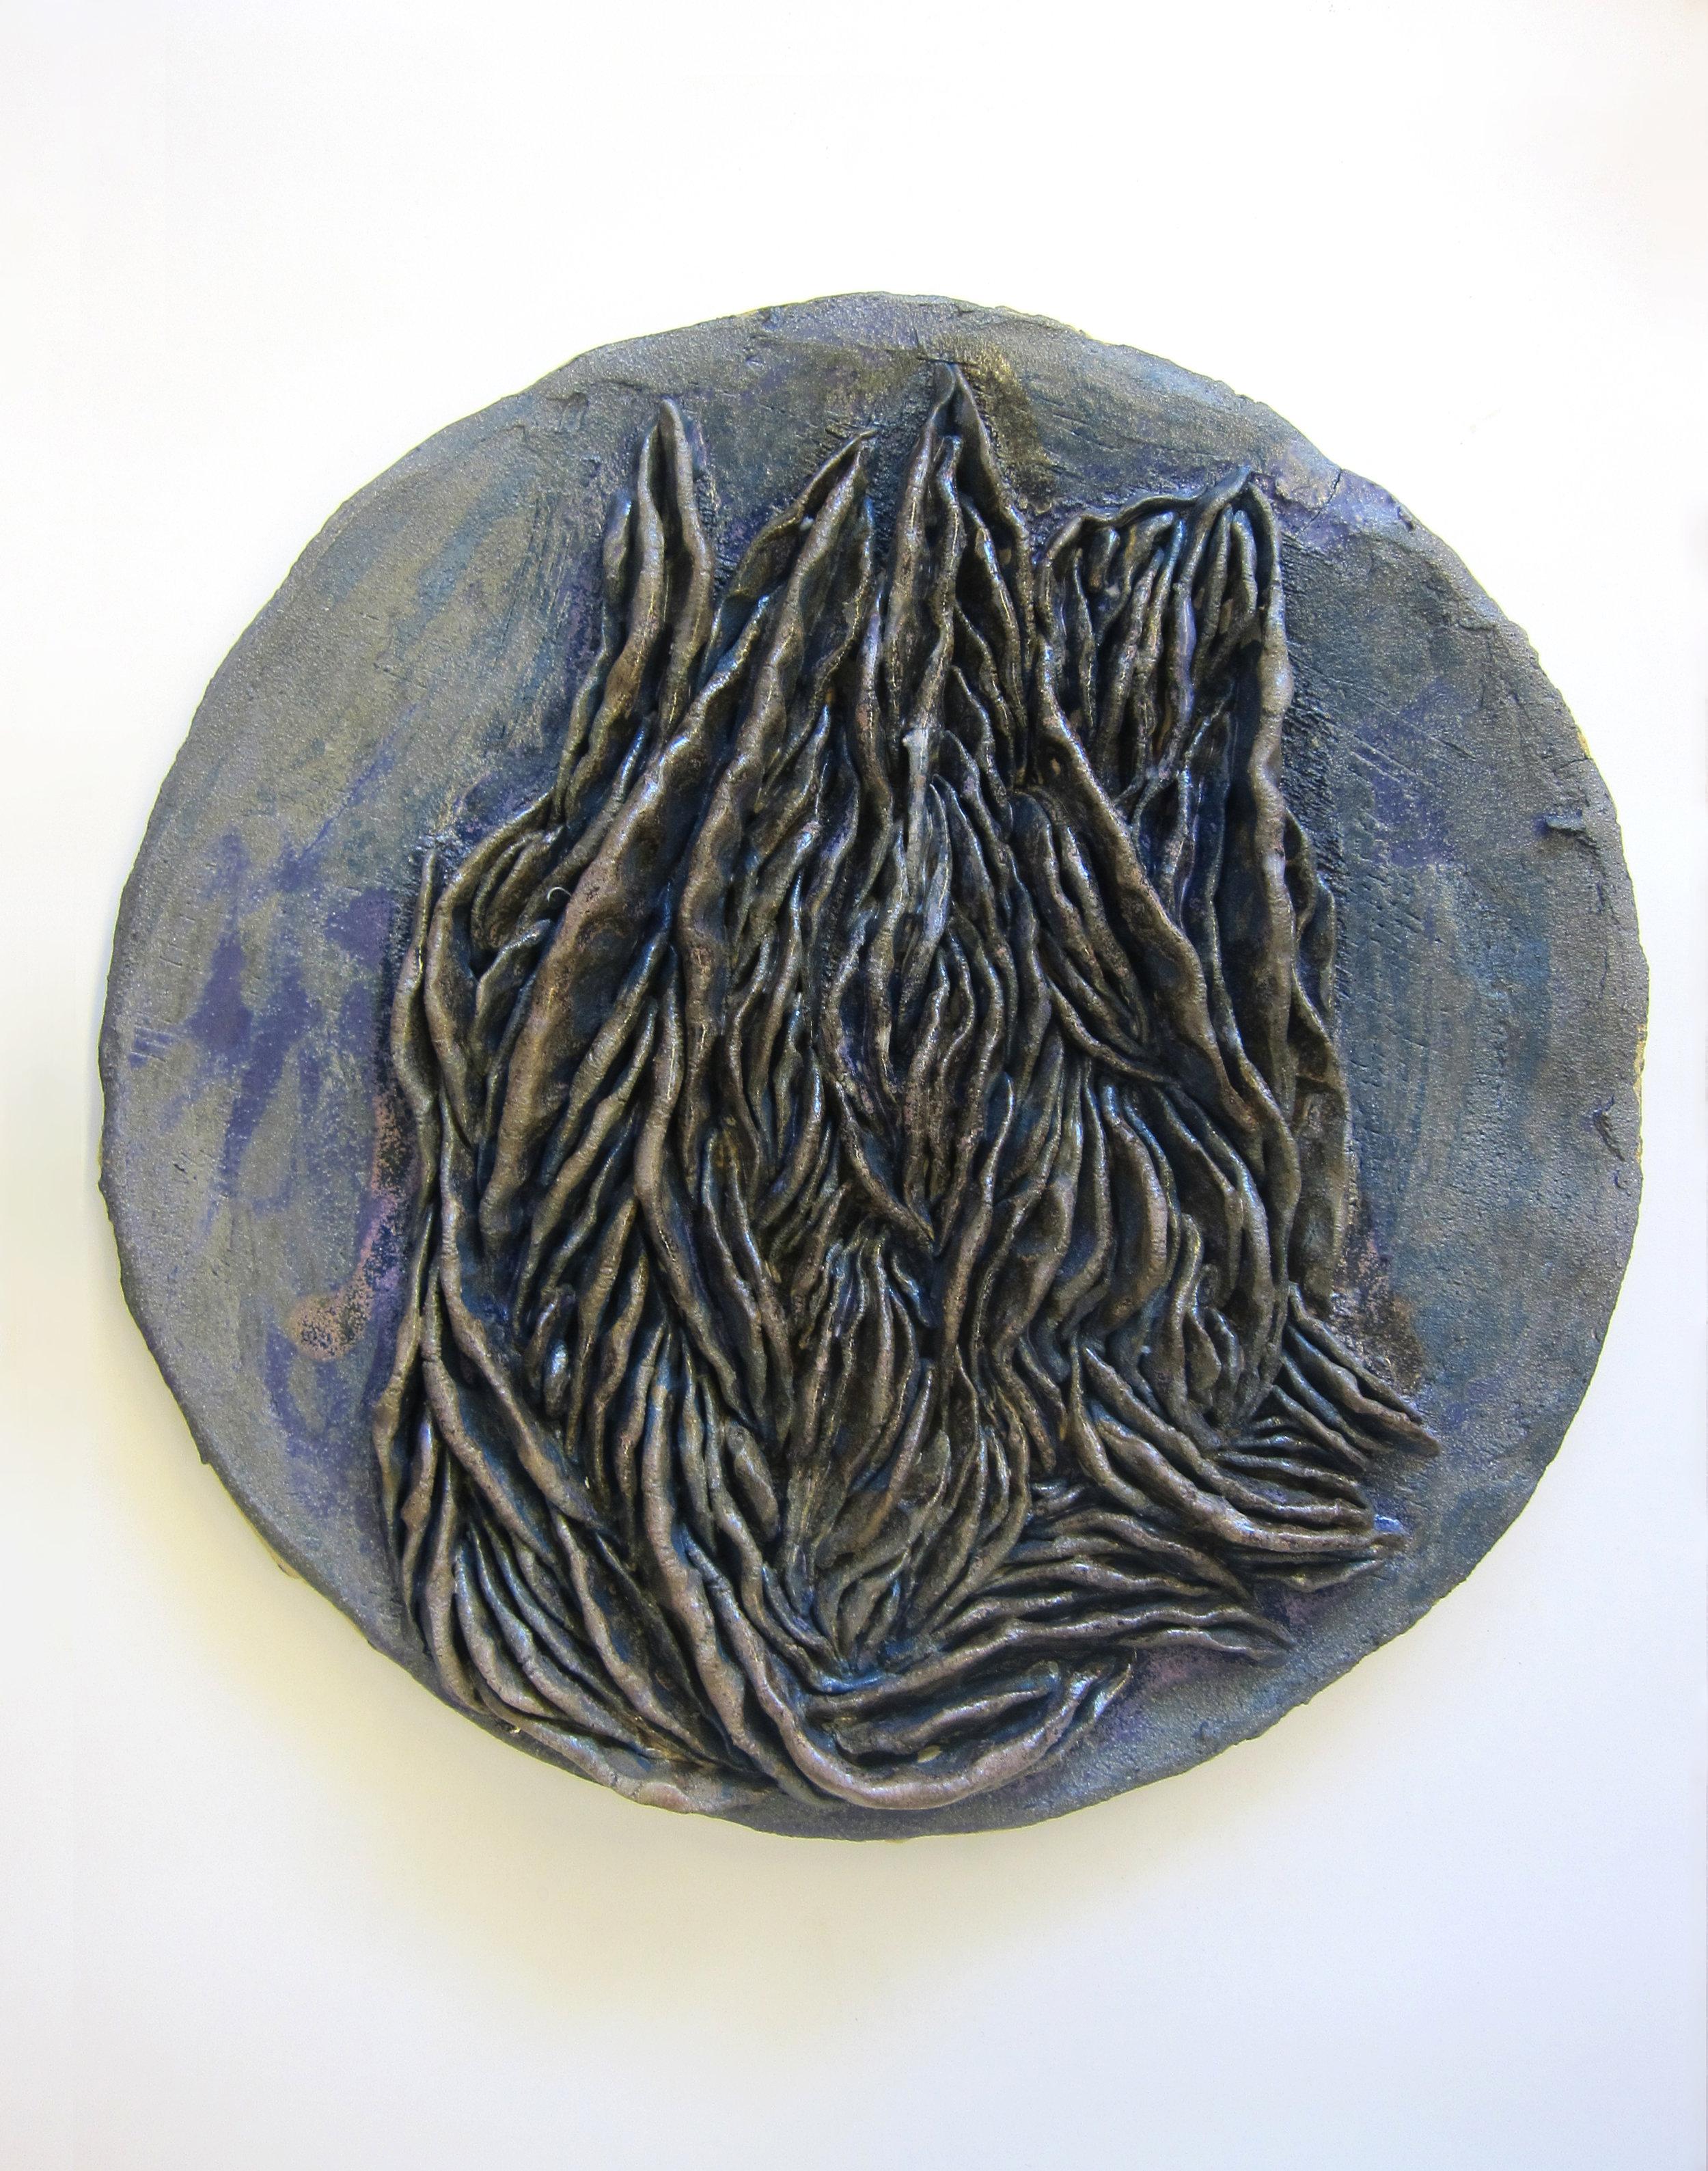 "Nicki Green,  Texture Studies (gills) , 2018. Glazed stoneware. 17"" x 17"" x 3"" each"